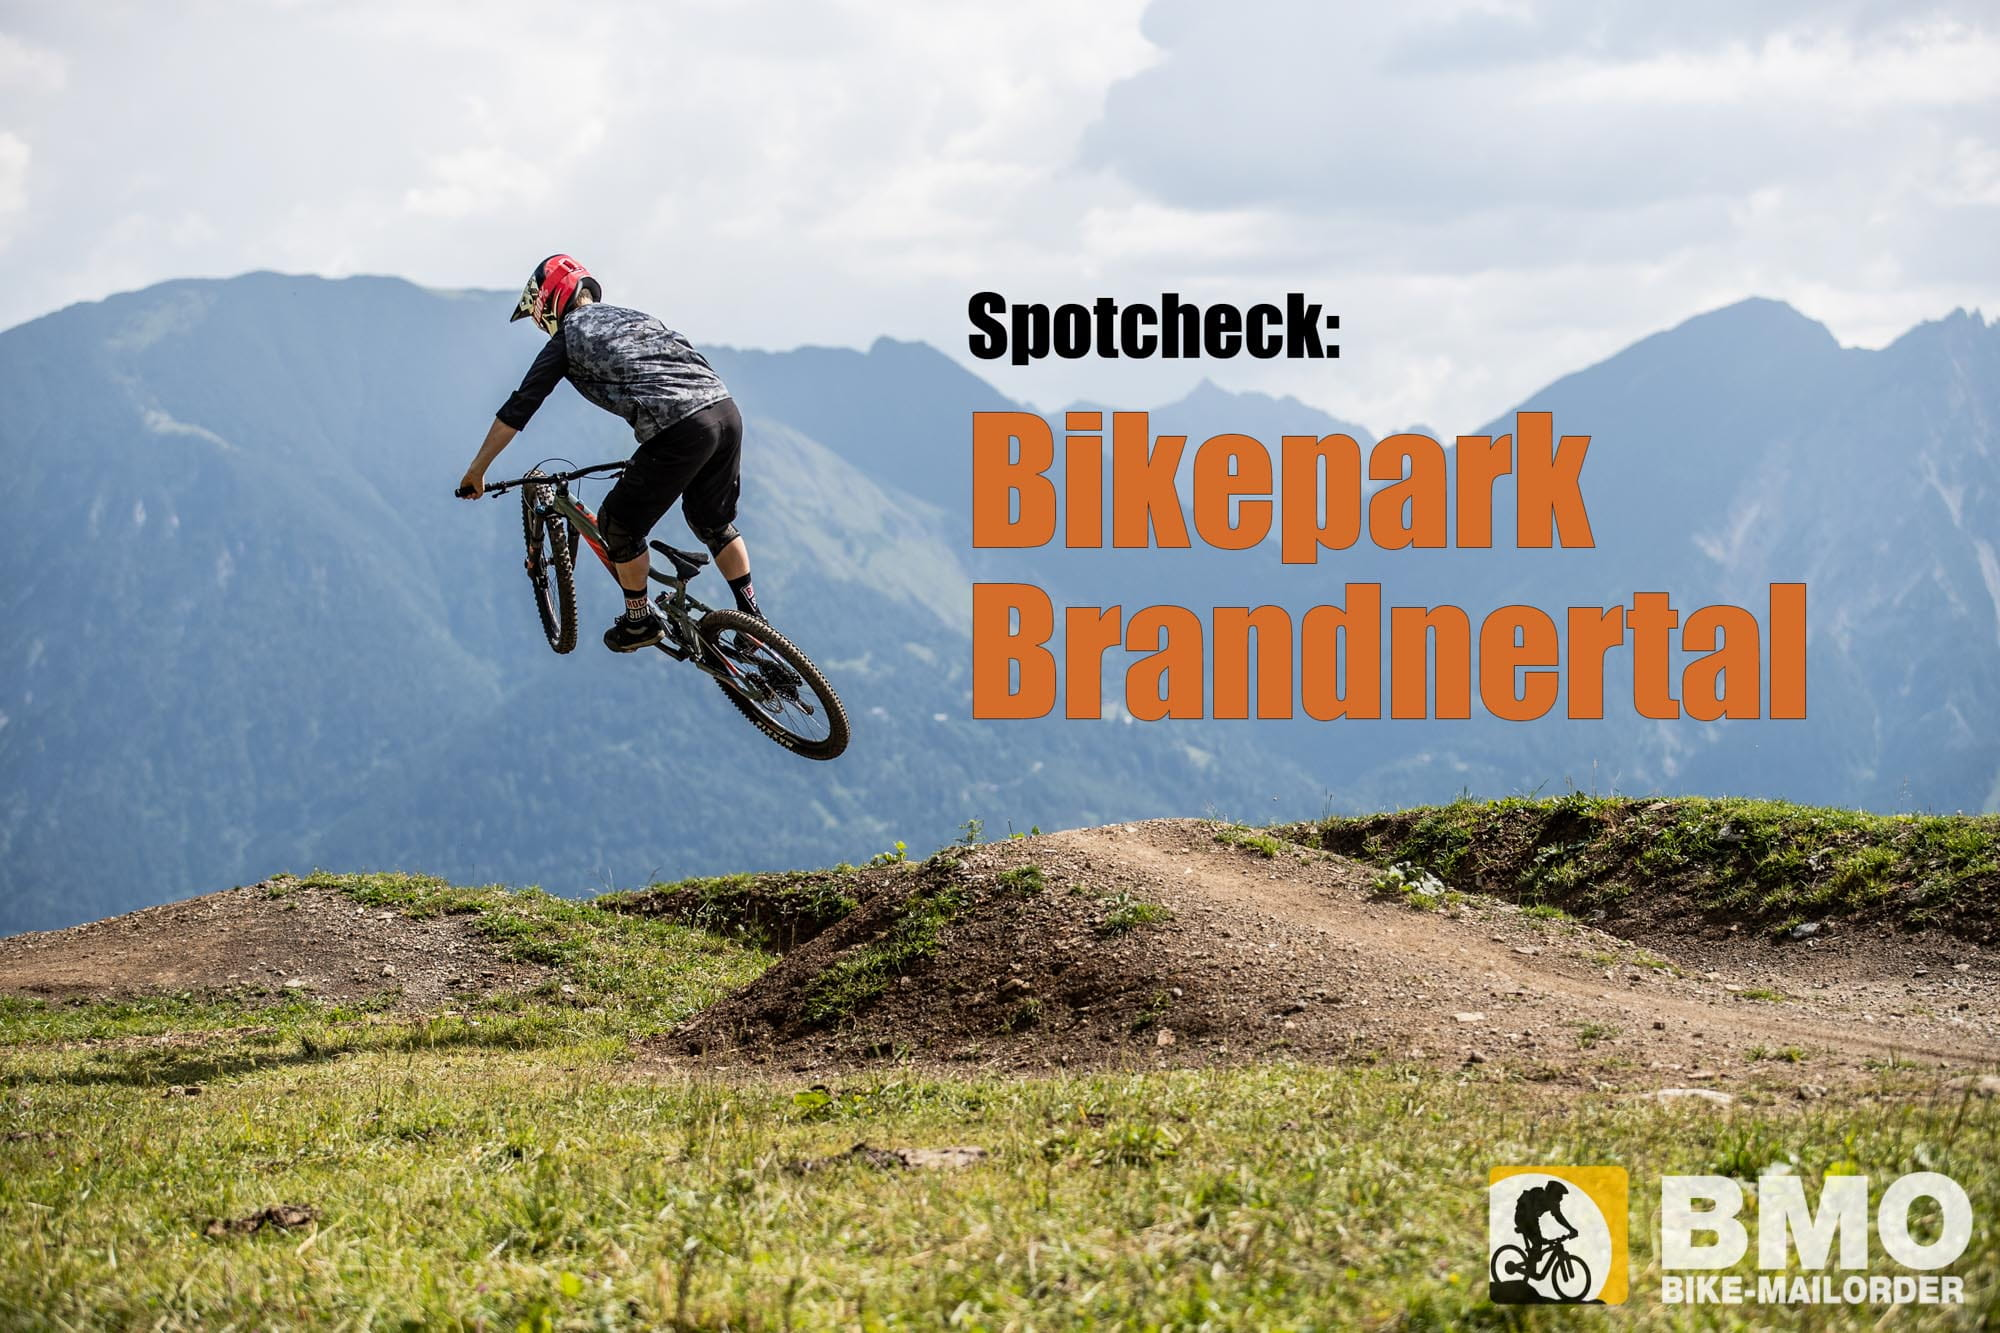 bmo-bike-mailorder-spotcheck-brandnertal-8